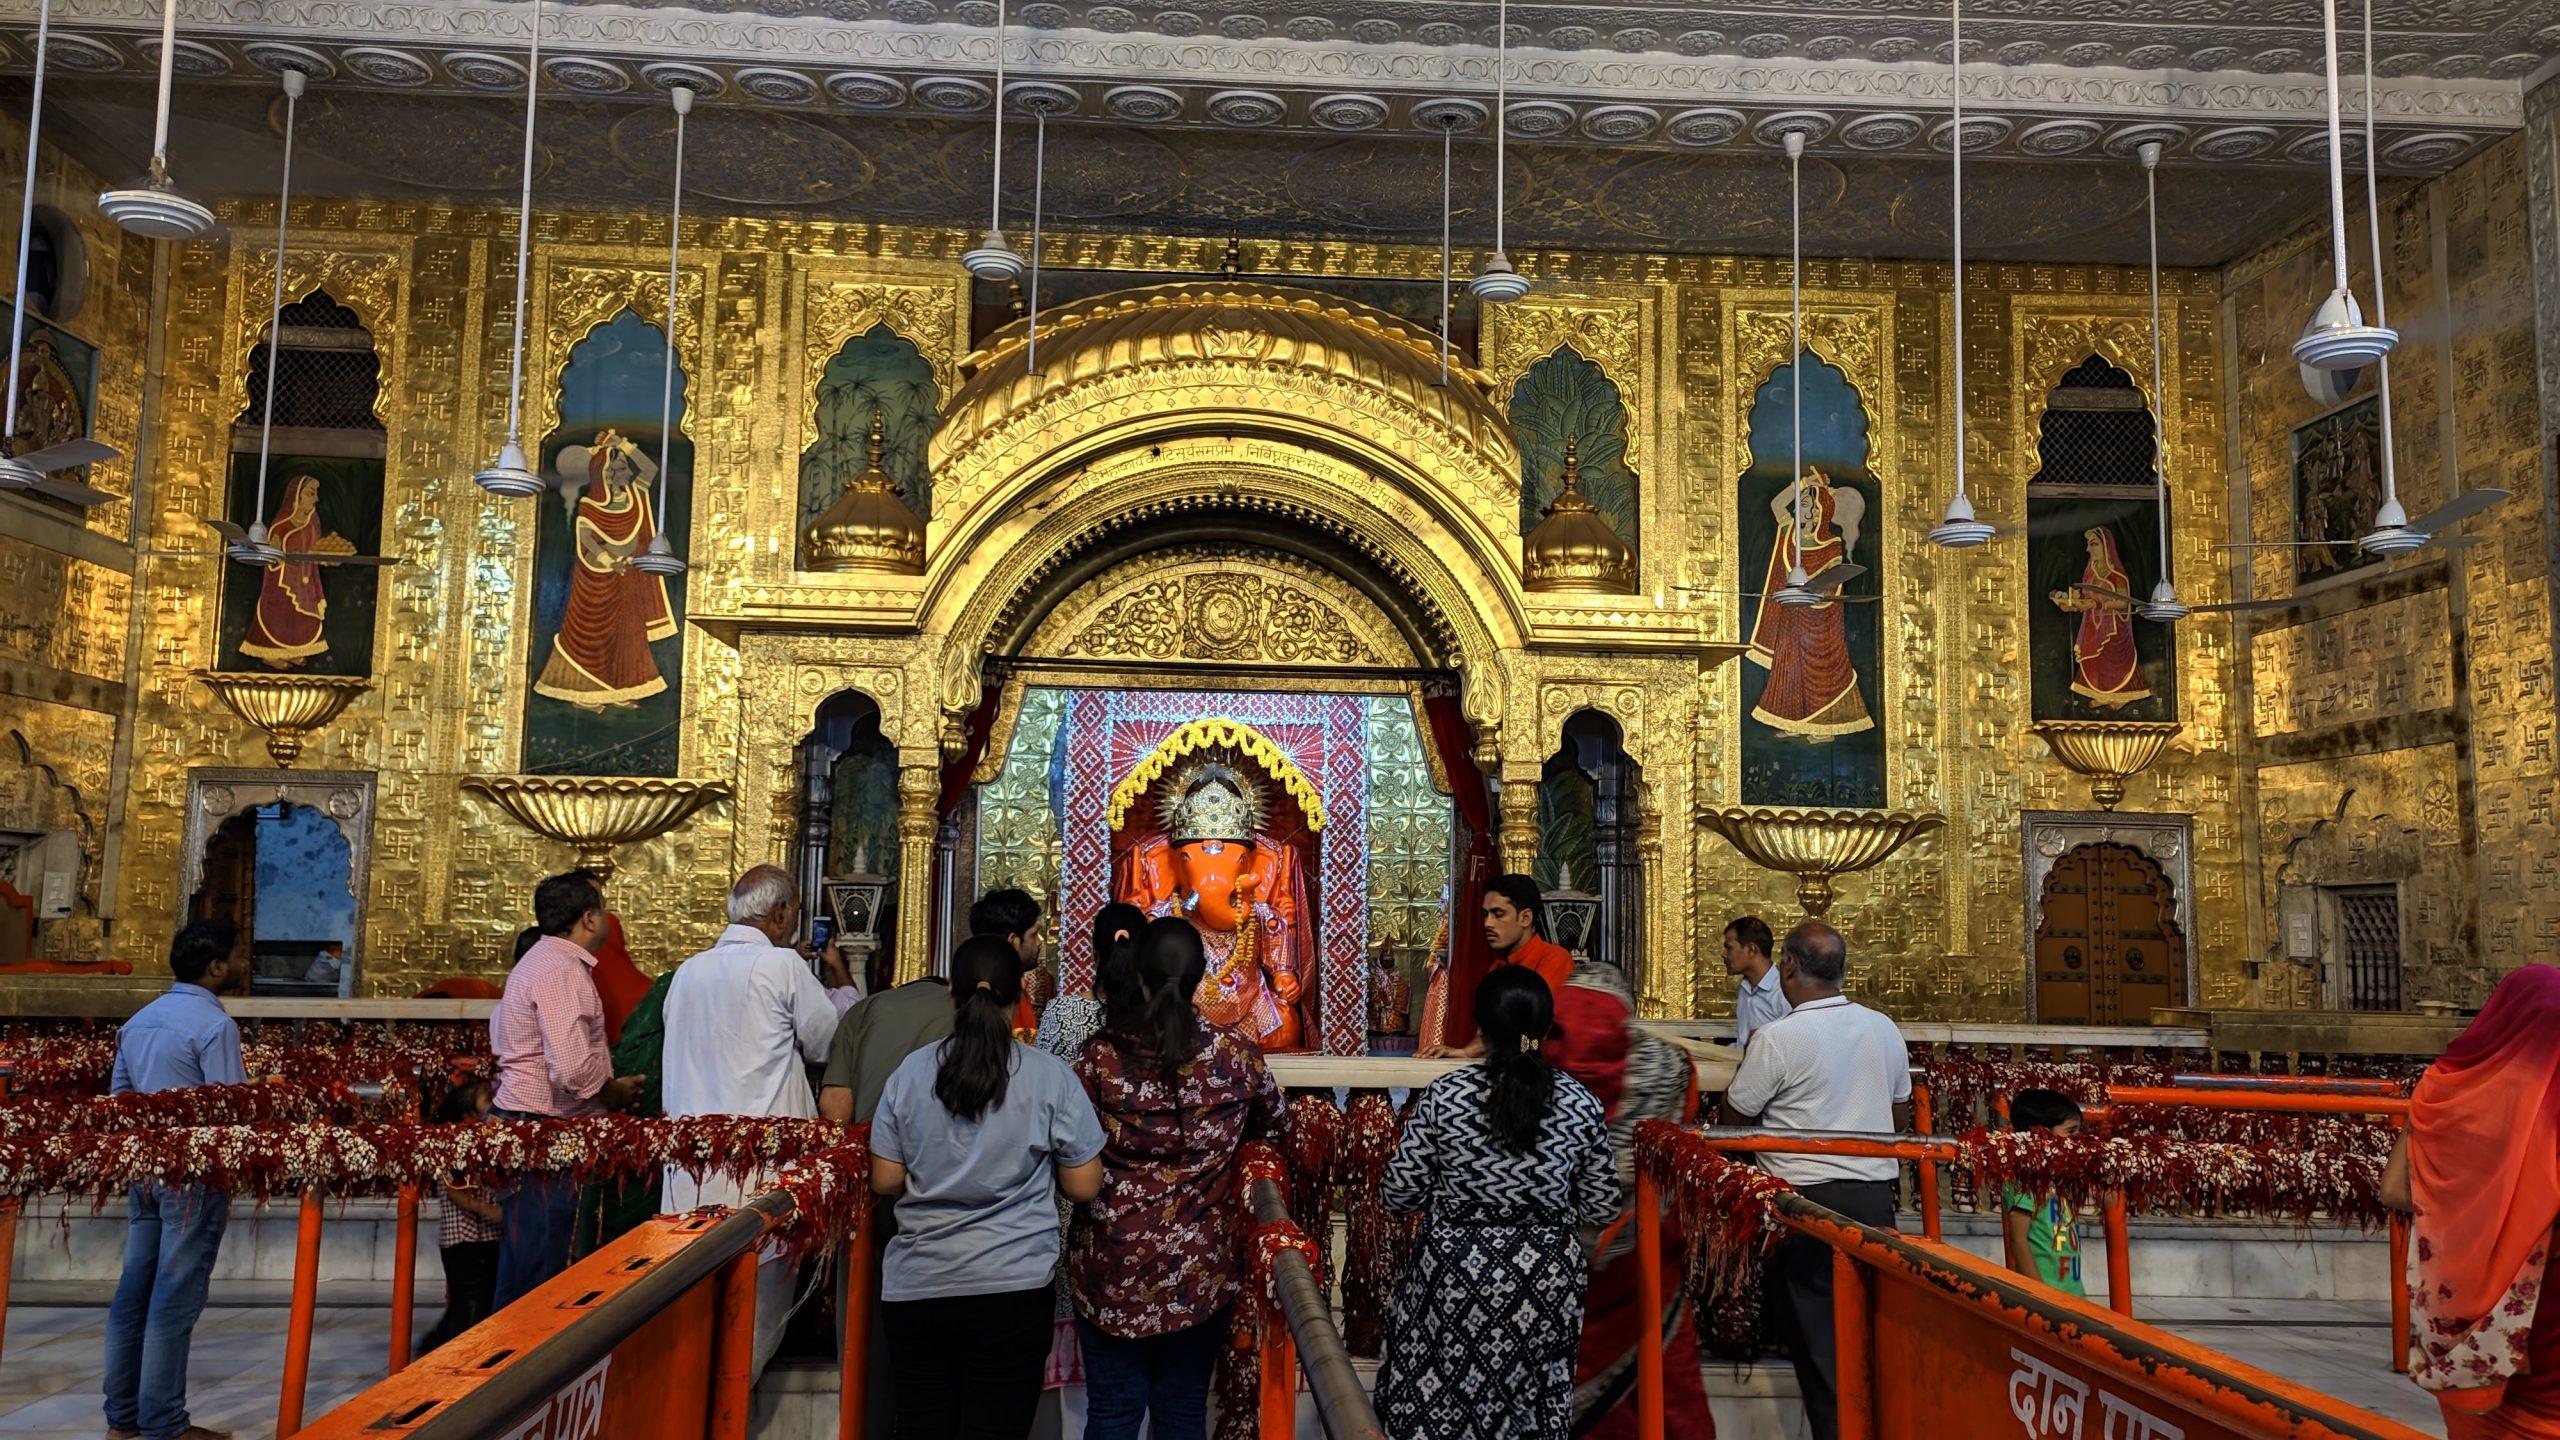 Moti Dungri in Jaipur